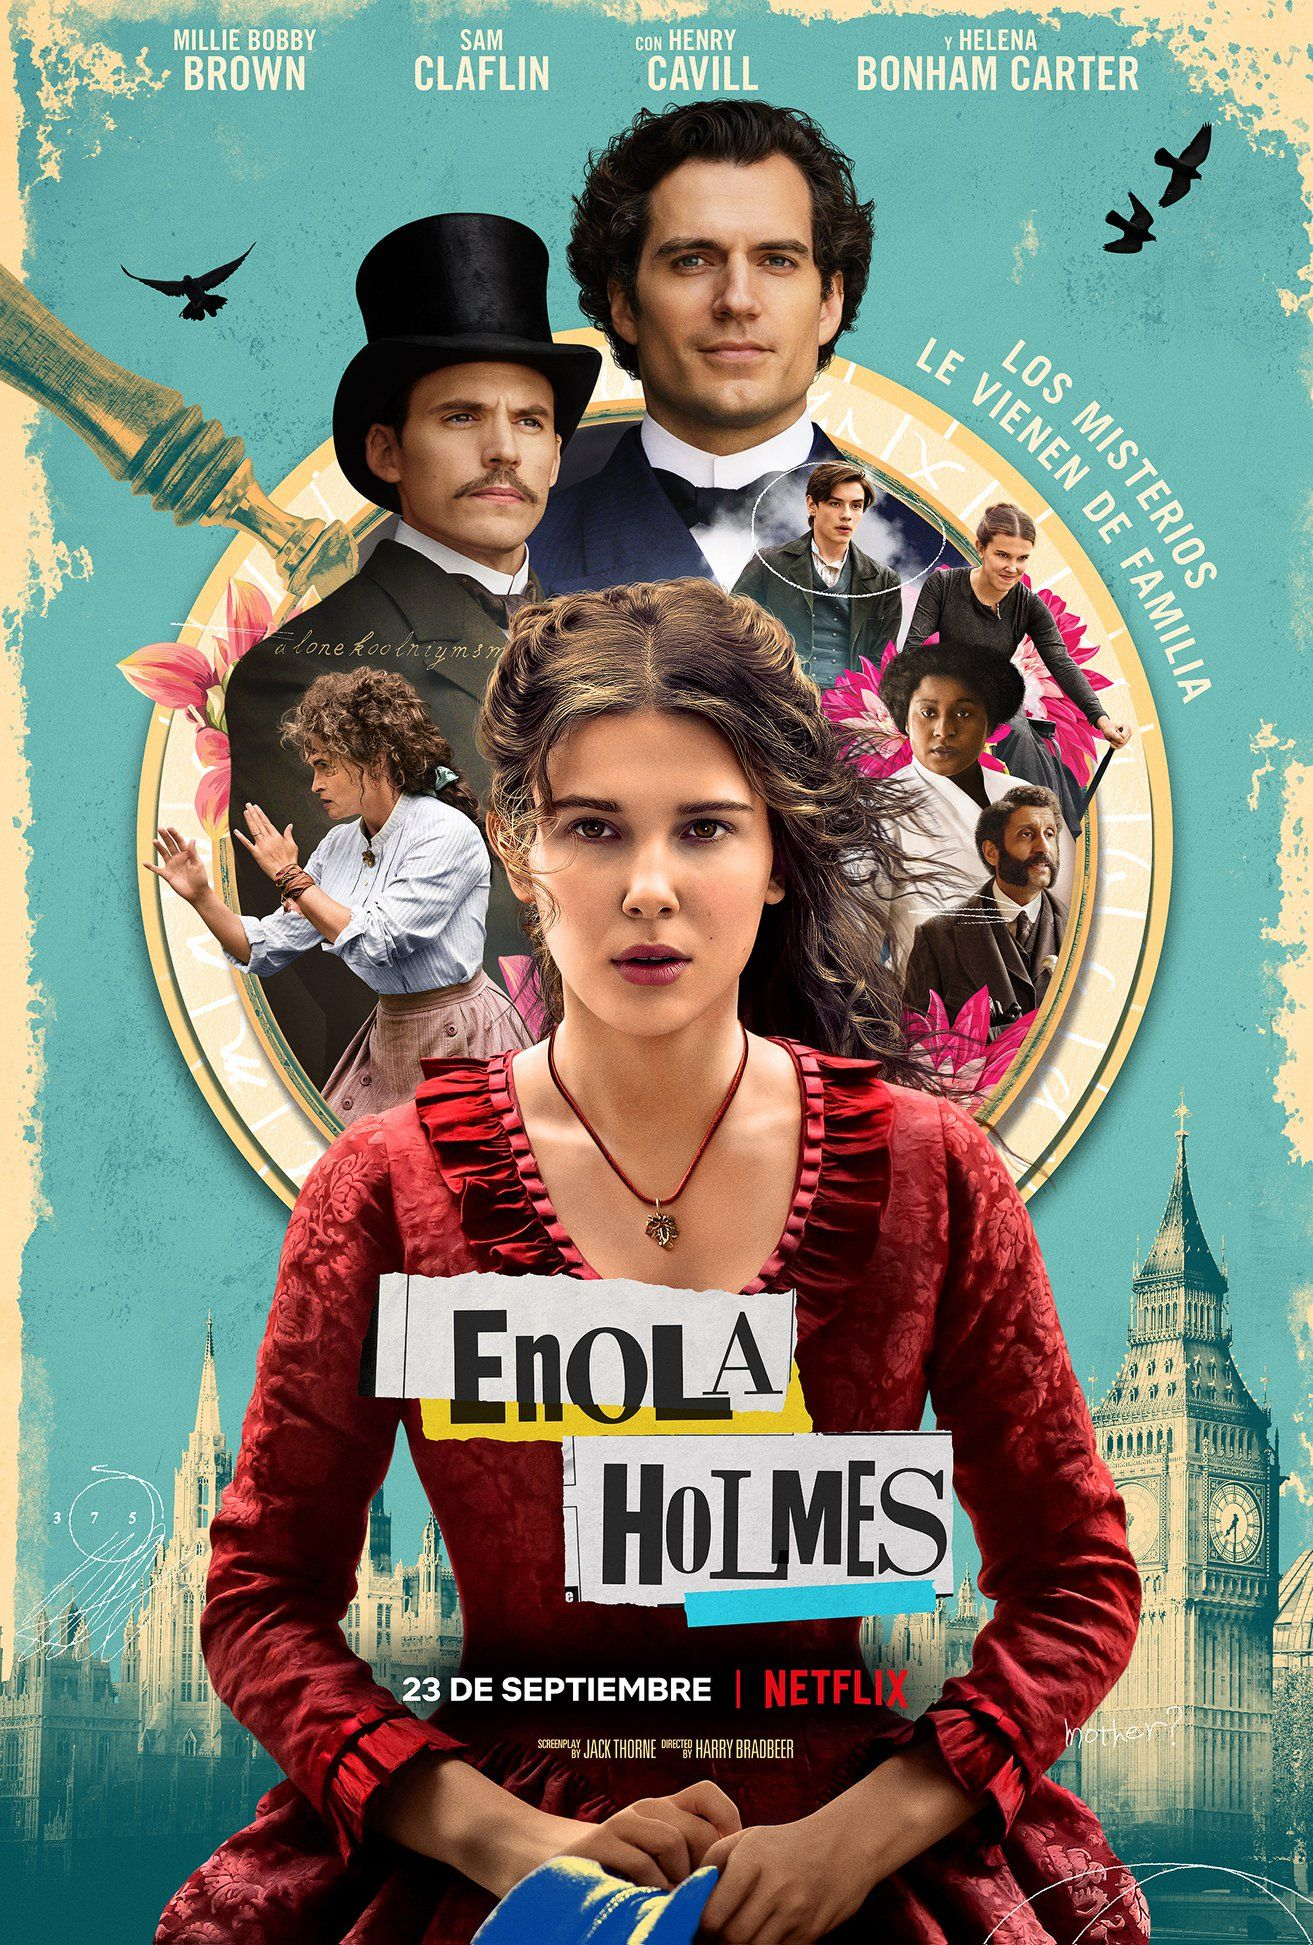 Enola Holmes Lanza Primer Teaser Con Millie Bobby Brown Y Henry Cavill Posteres De Filmes Love Filmes Filmes